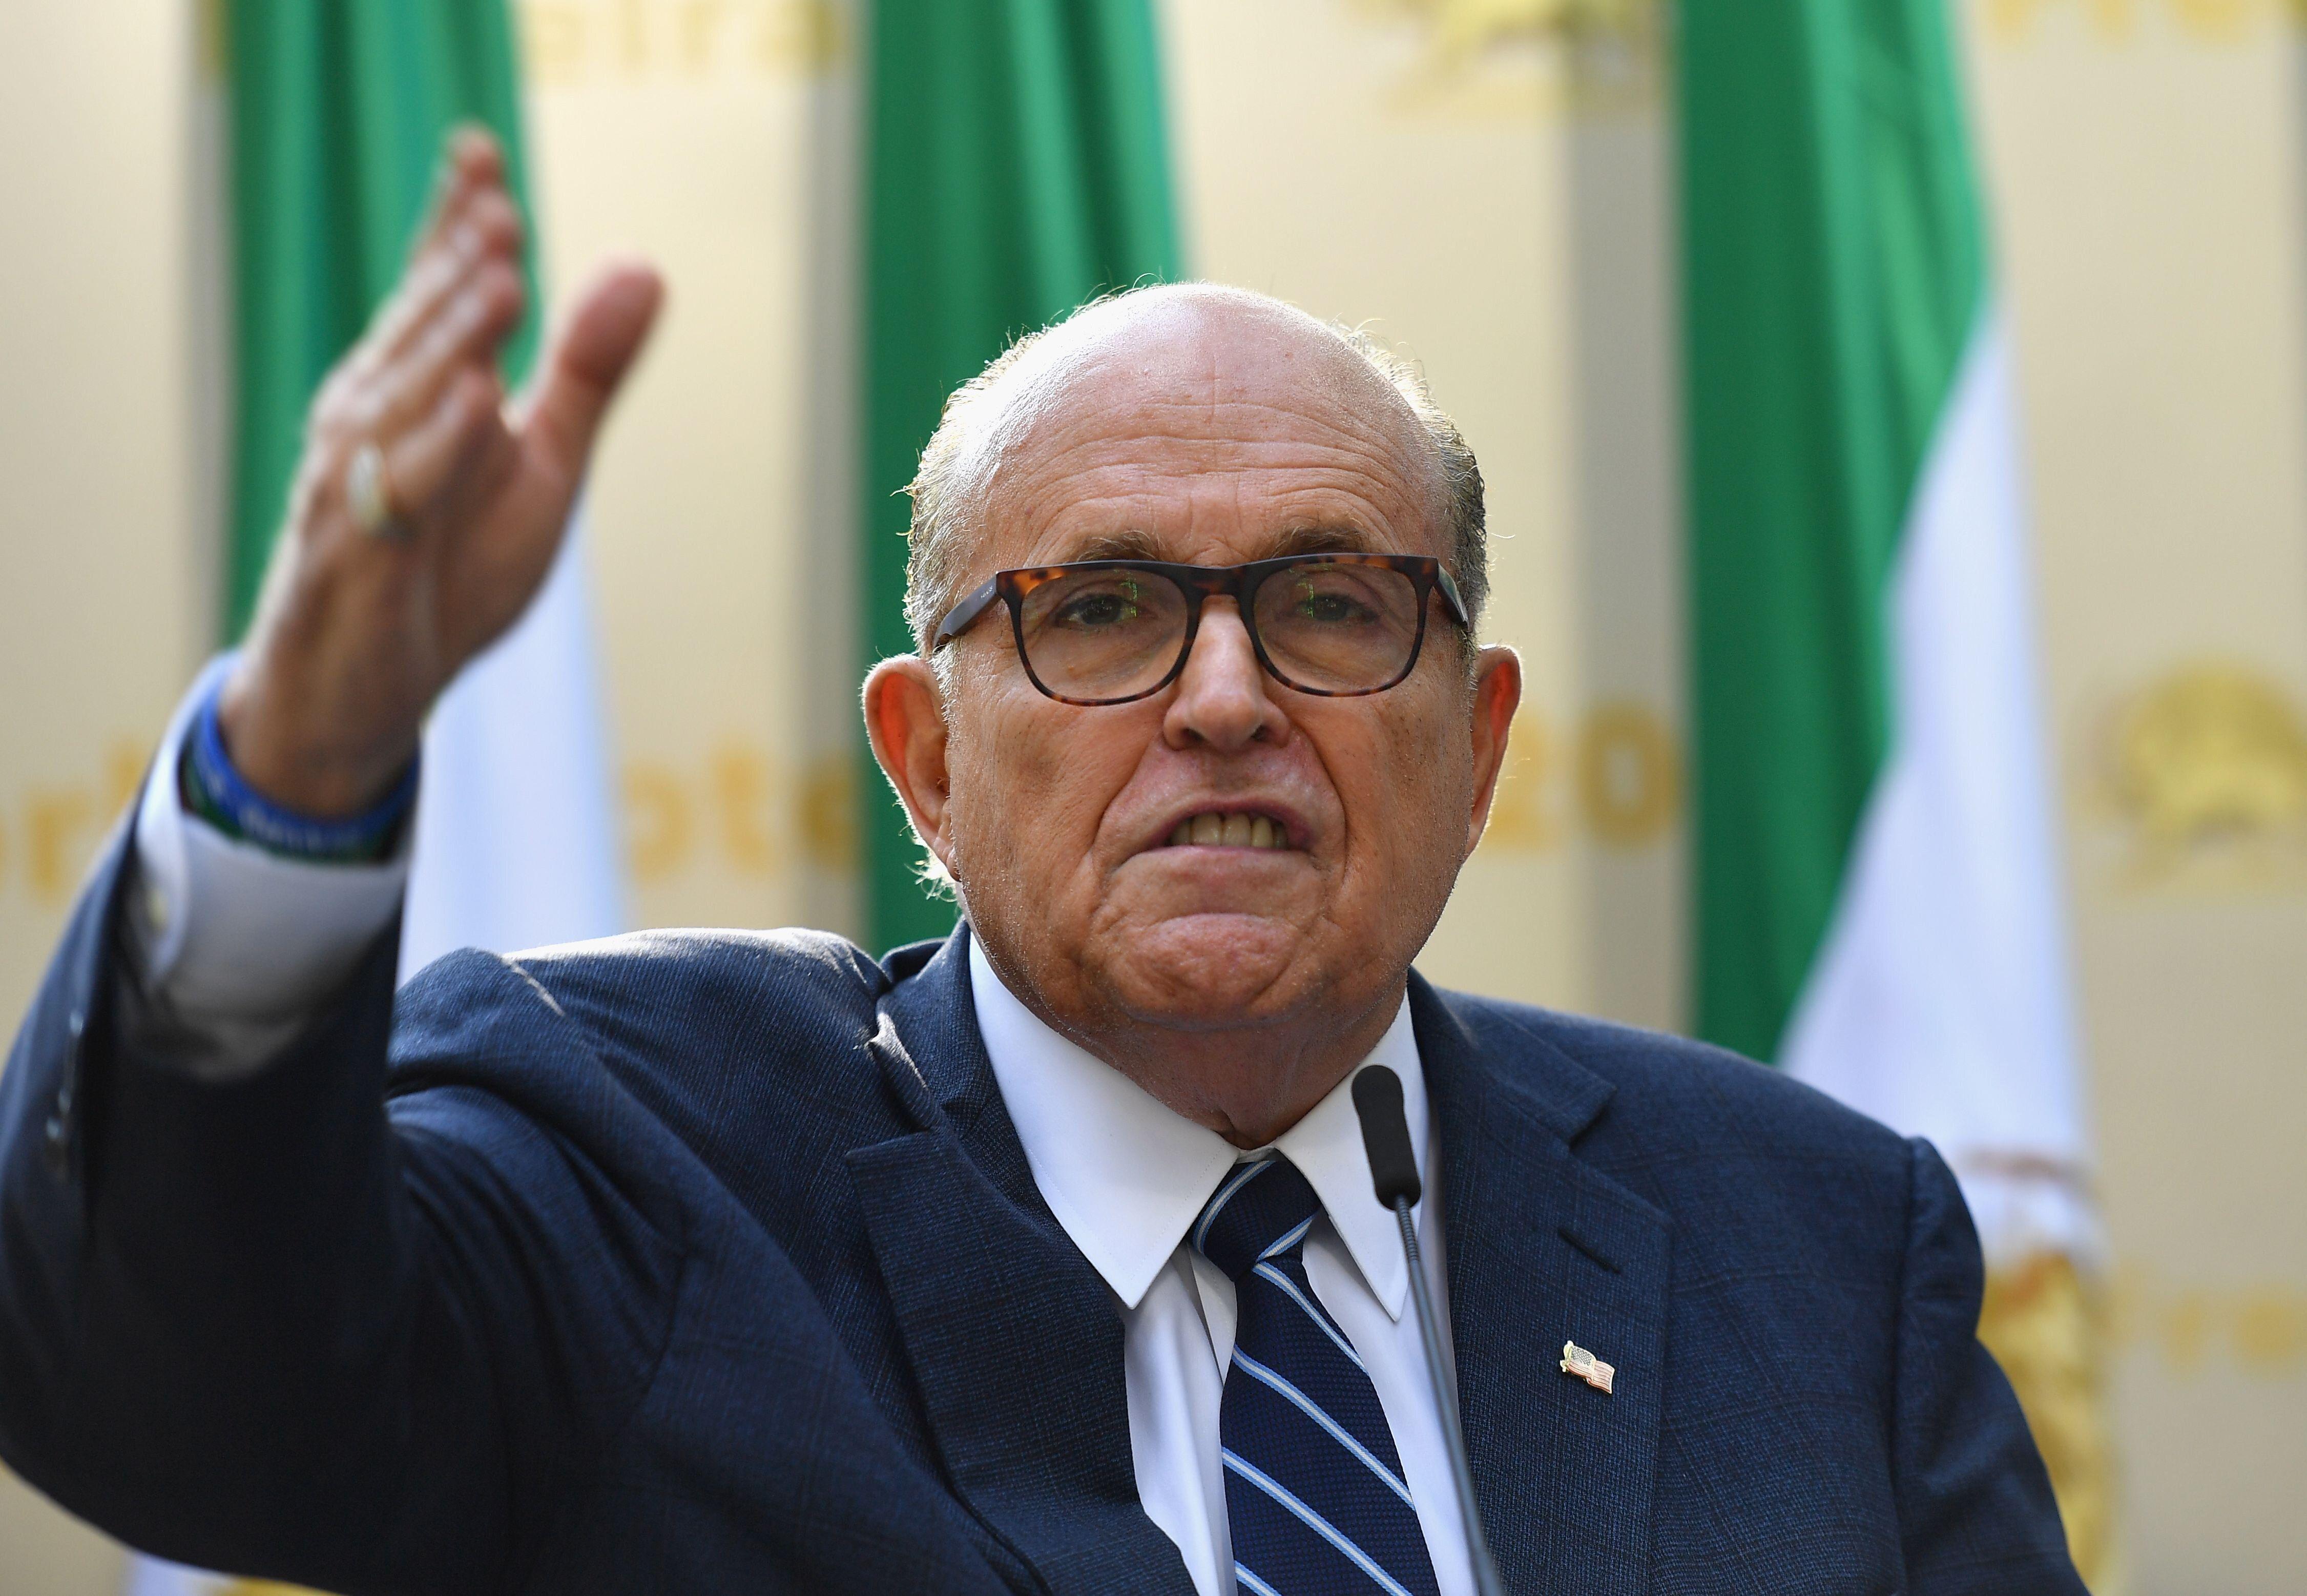 Giuliani Indicates He'll Report On Ukraine Trip This Week